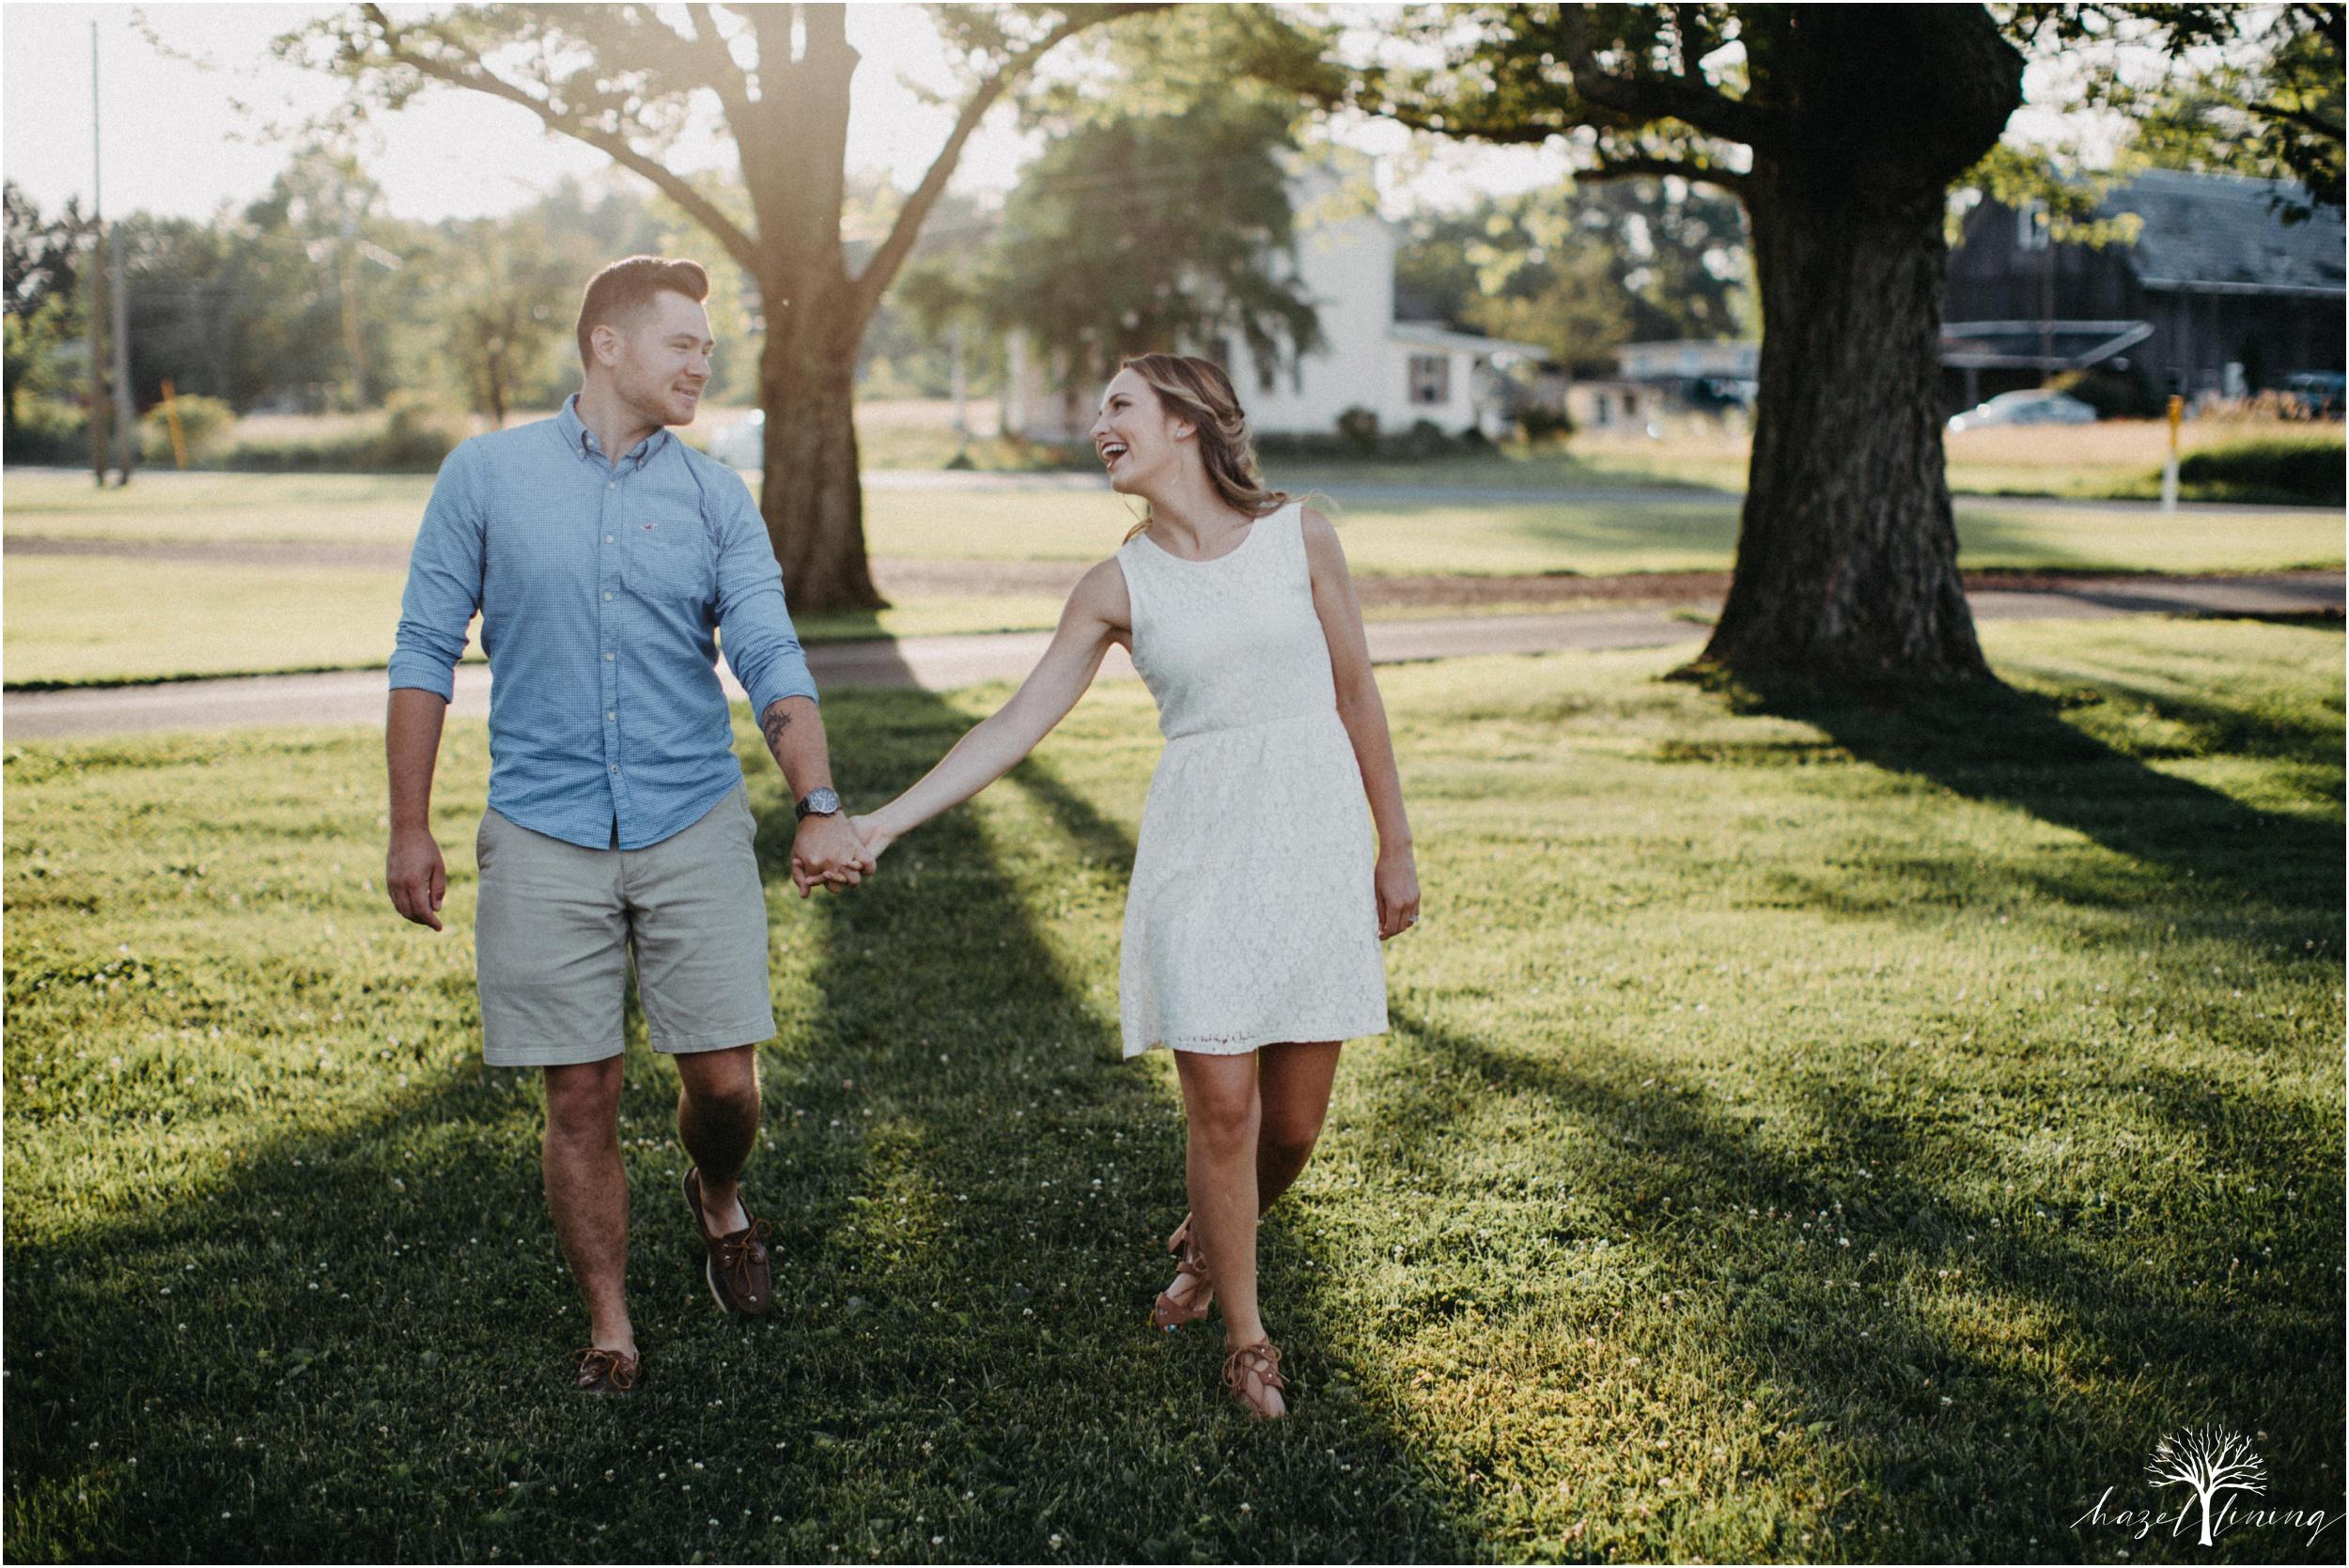 rachel-warner-chris-niedrist-the-farm-bakery-and-events-quakertown-pa-summer-engagement-hazel-lining-photography-destination-elopement-wedding-engagement-photography_0001.jpg